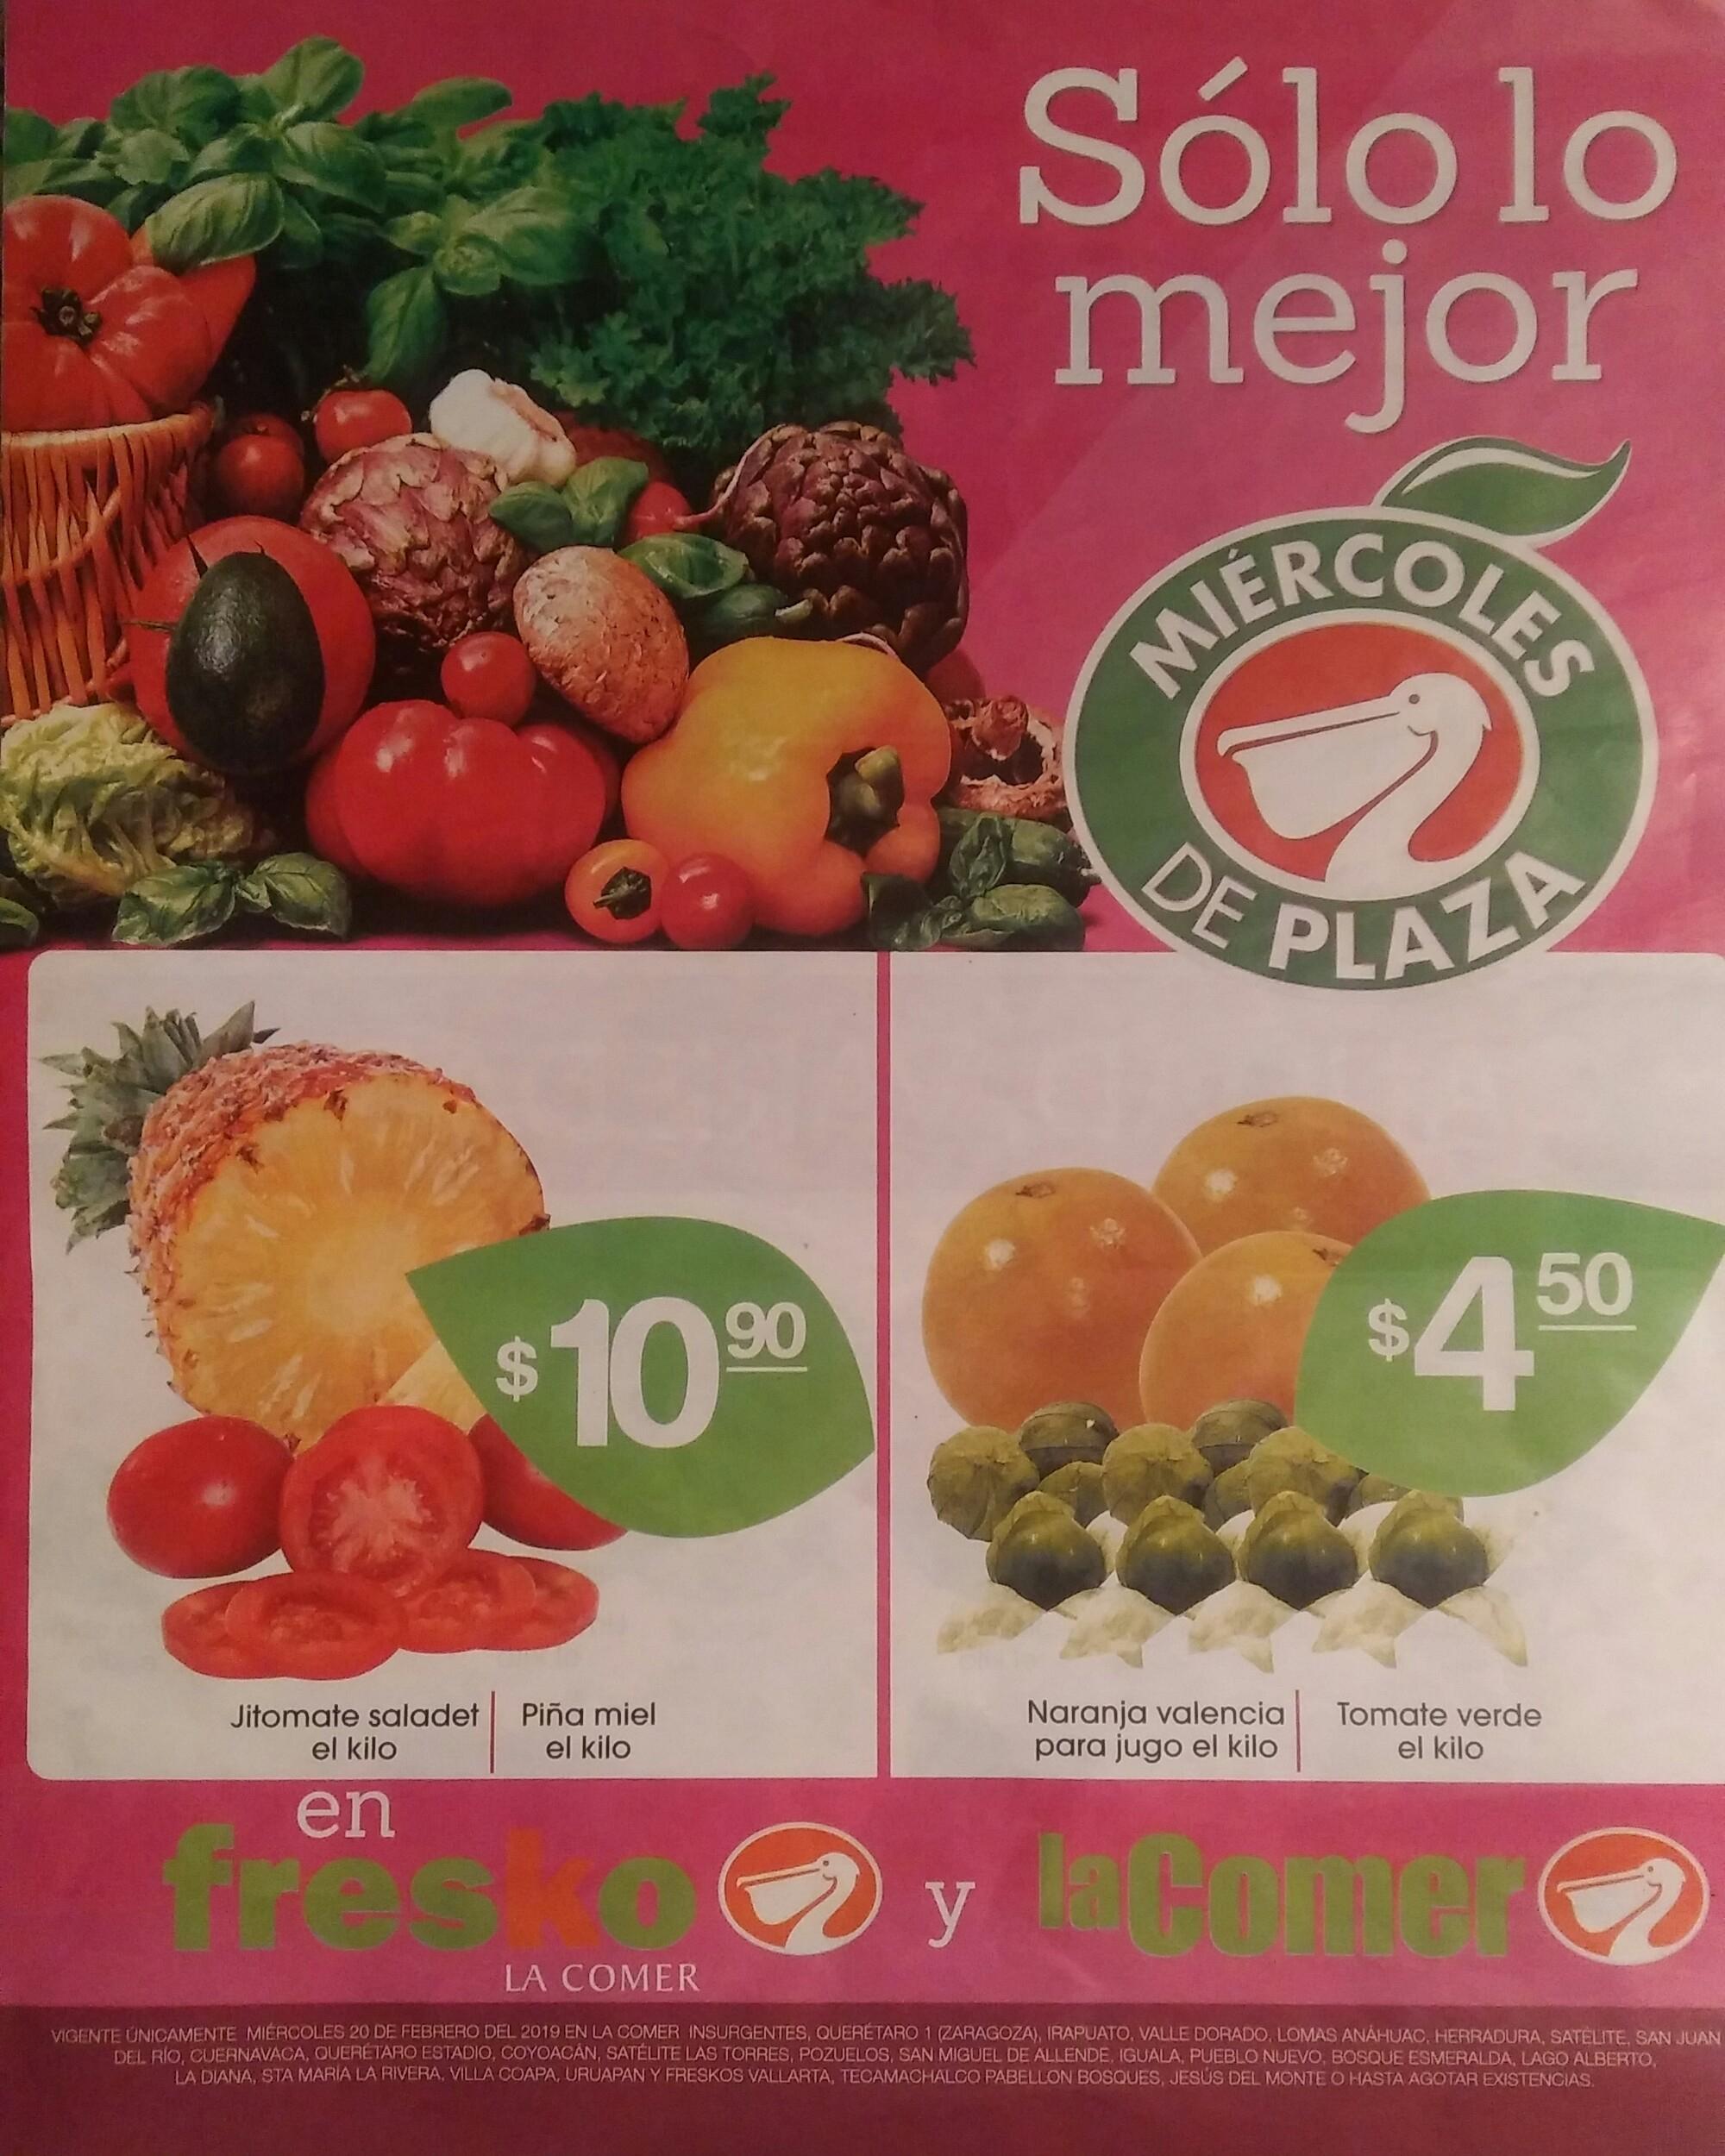 La Comer y Fresko: Miércoles de Plaza 20 Febrero: Naranja ó Tomate Verde $4.50 kg... Piña ó Jitomate $10.90 kg.